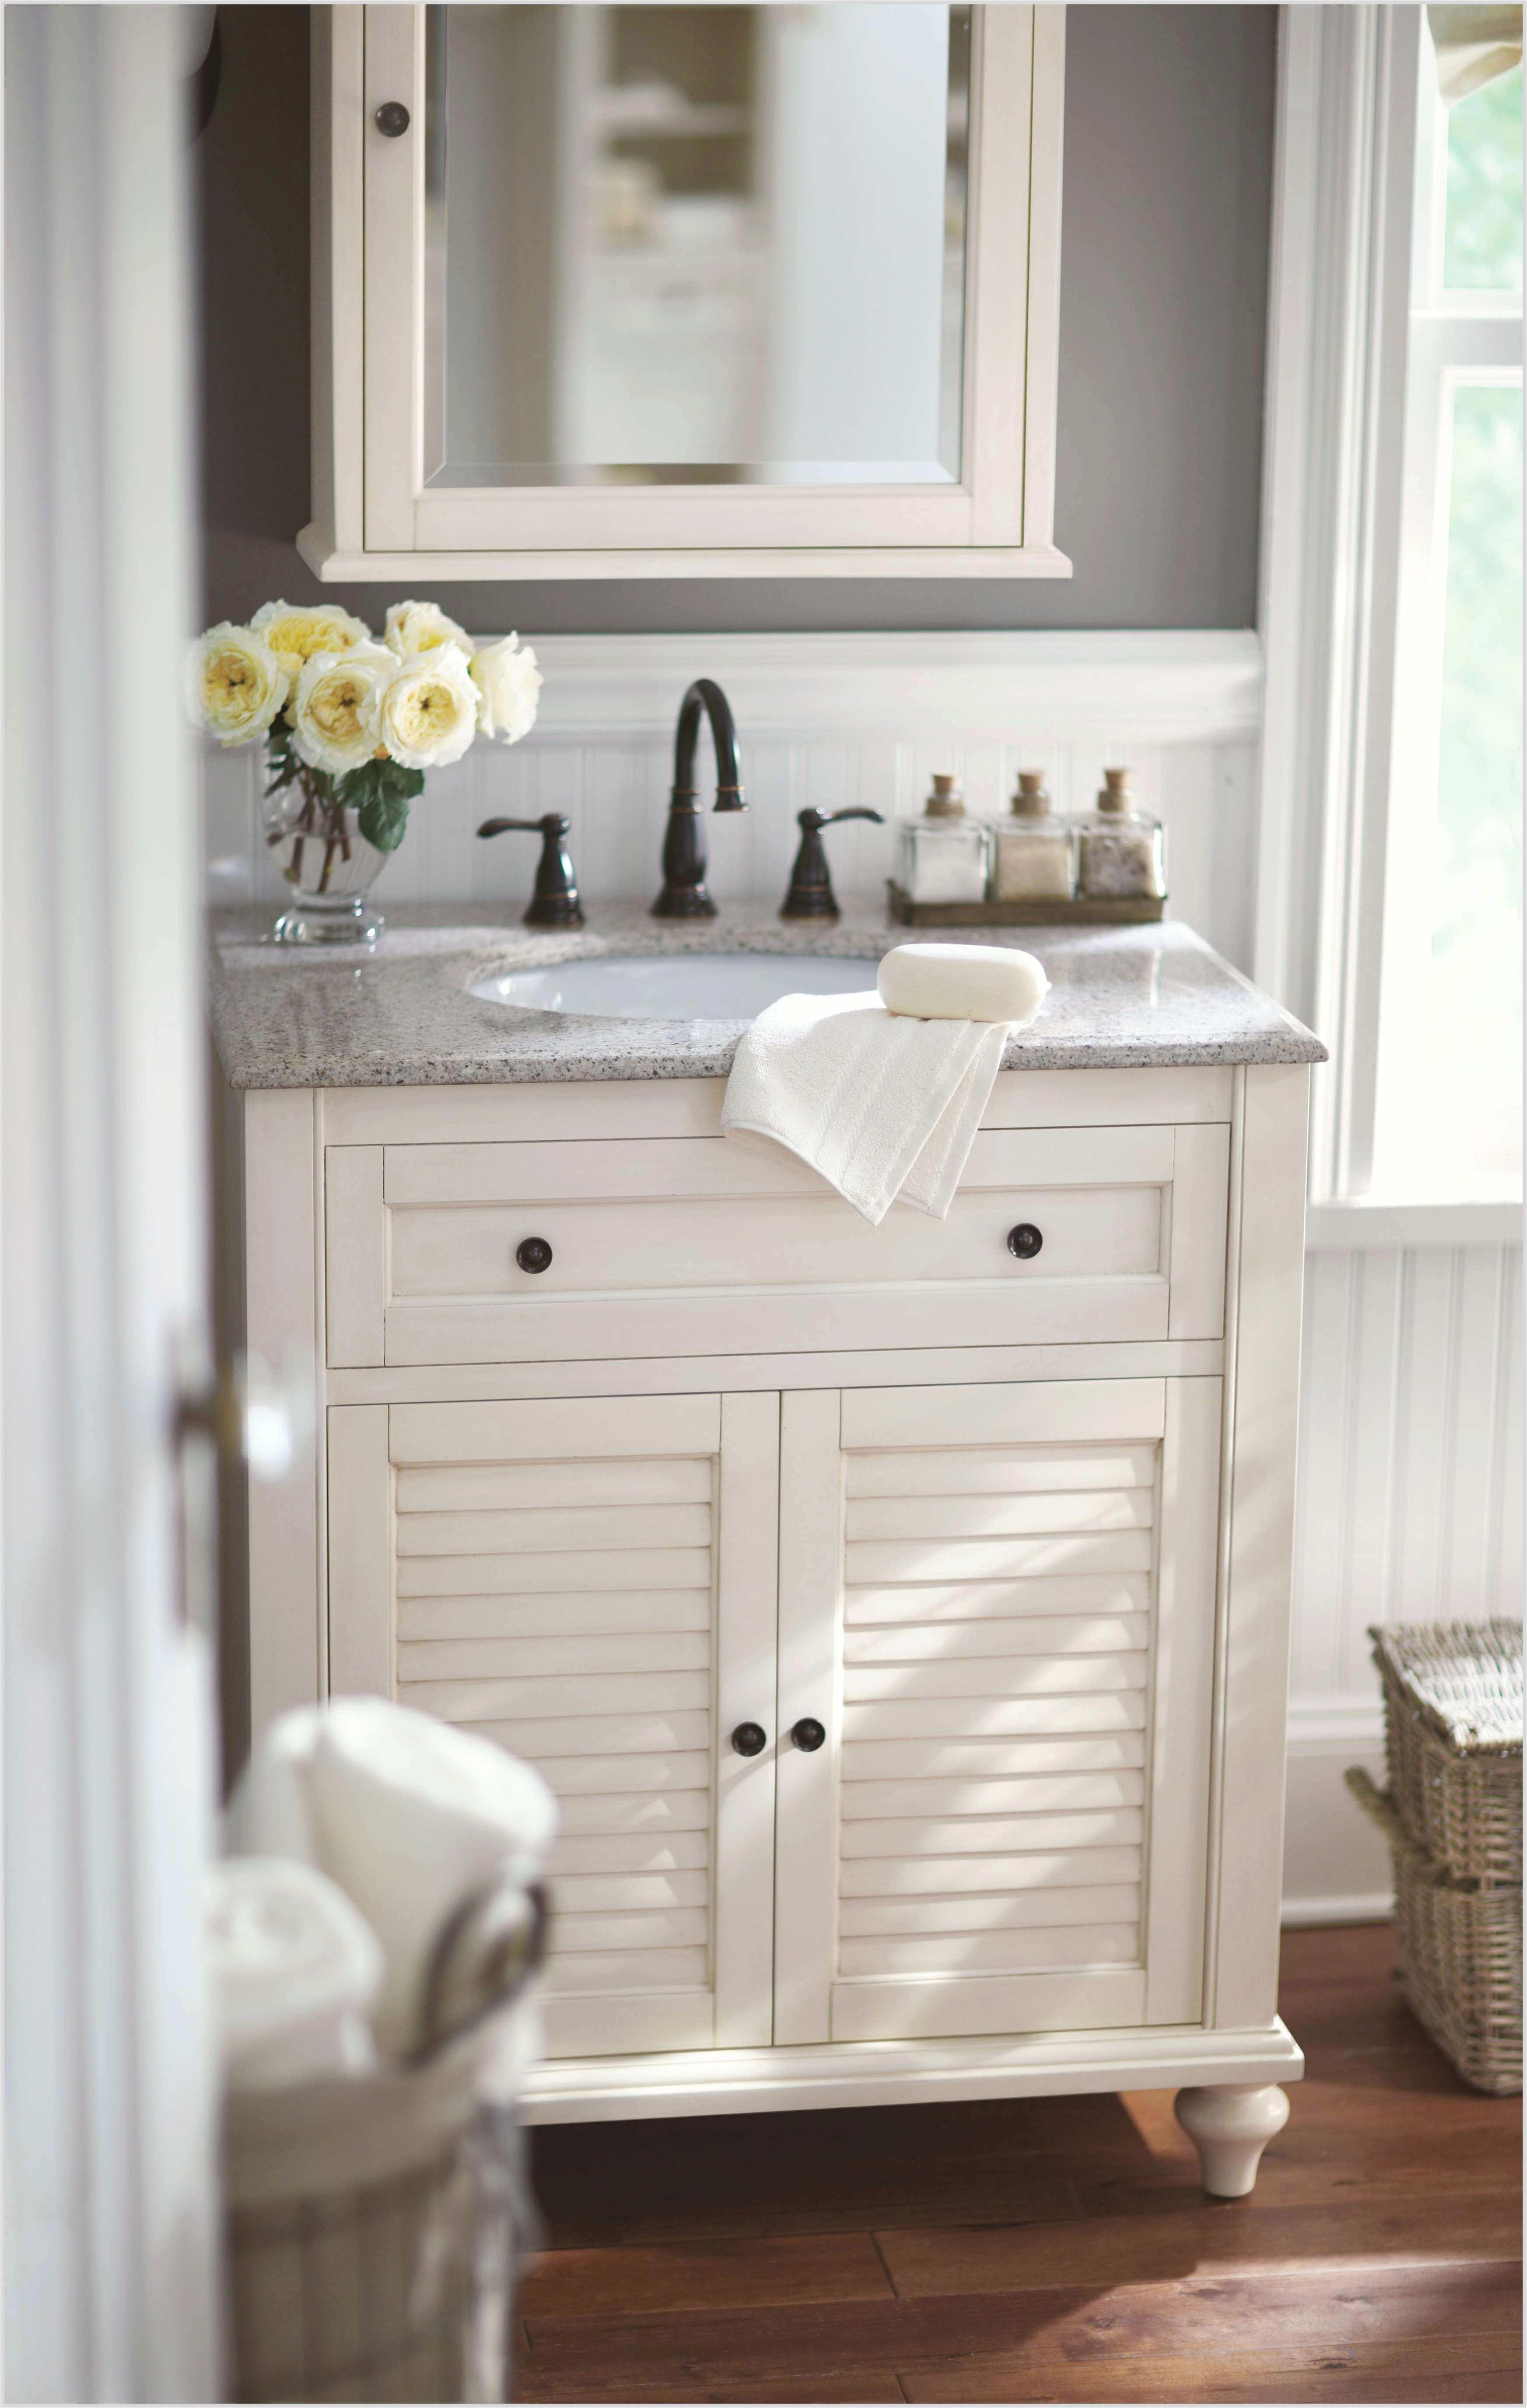 Walmart Bathroom Vanities with Sink Bewitching Walmart Bathroom Vanity at Walmart Bathroom Vanities with